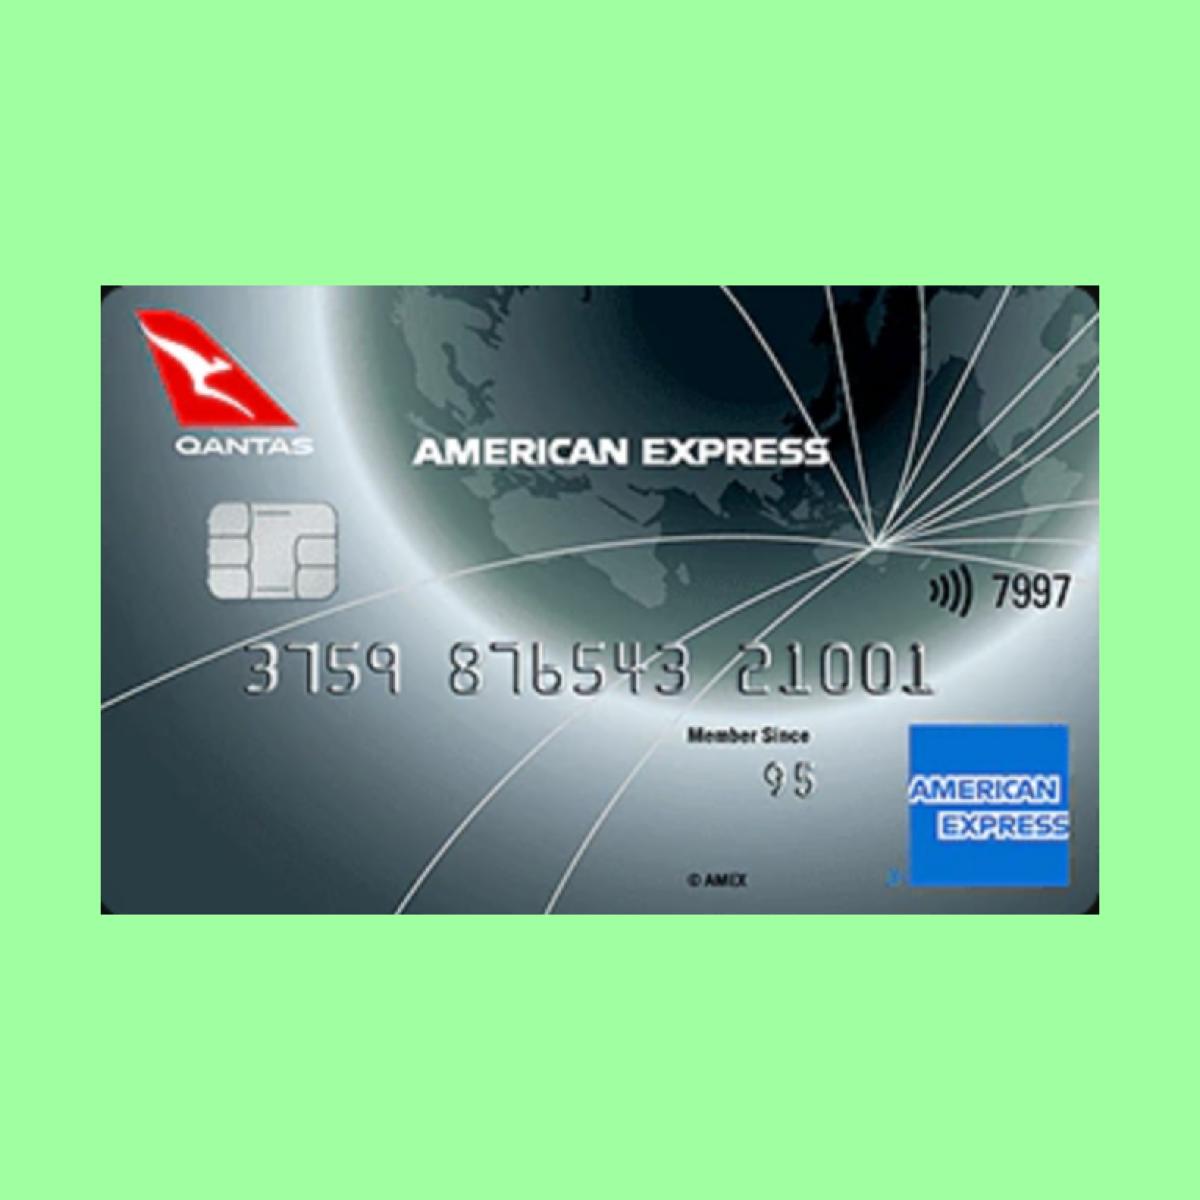 Qantas Amex Ultimate Card The Point Calculator Travel Credit Reward Card Bonus Cash